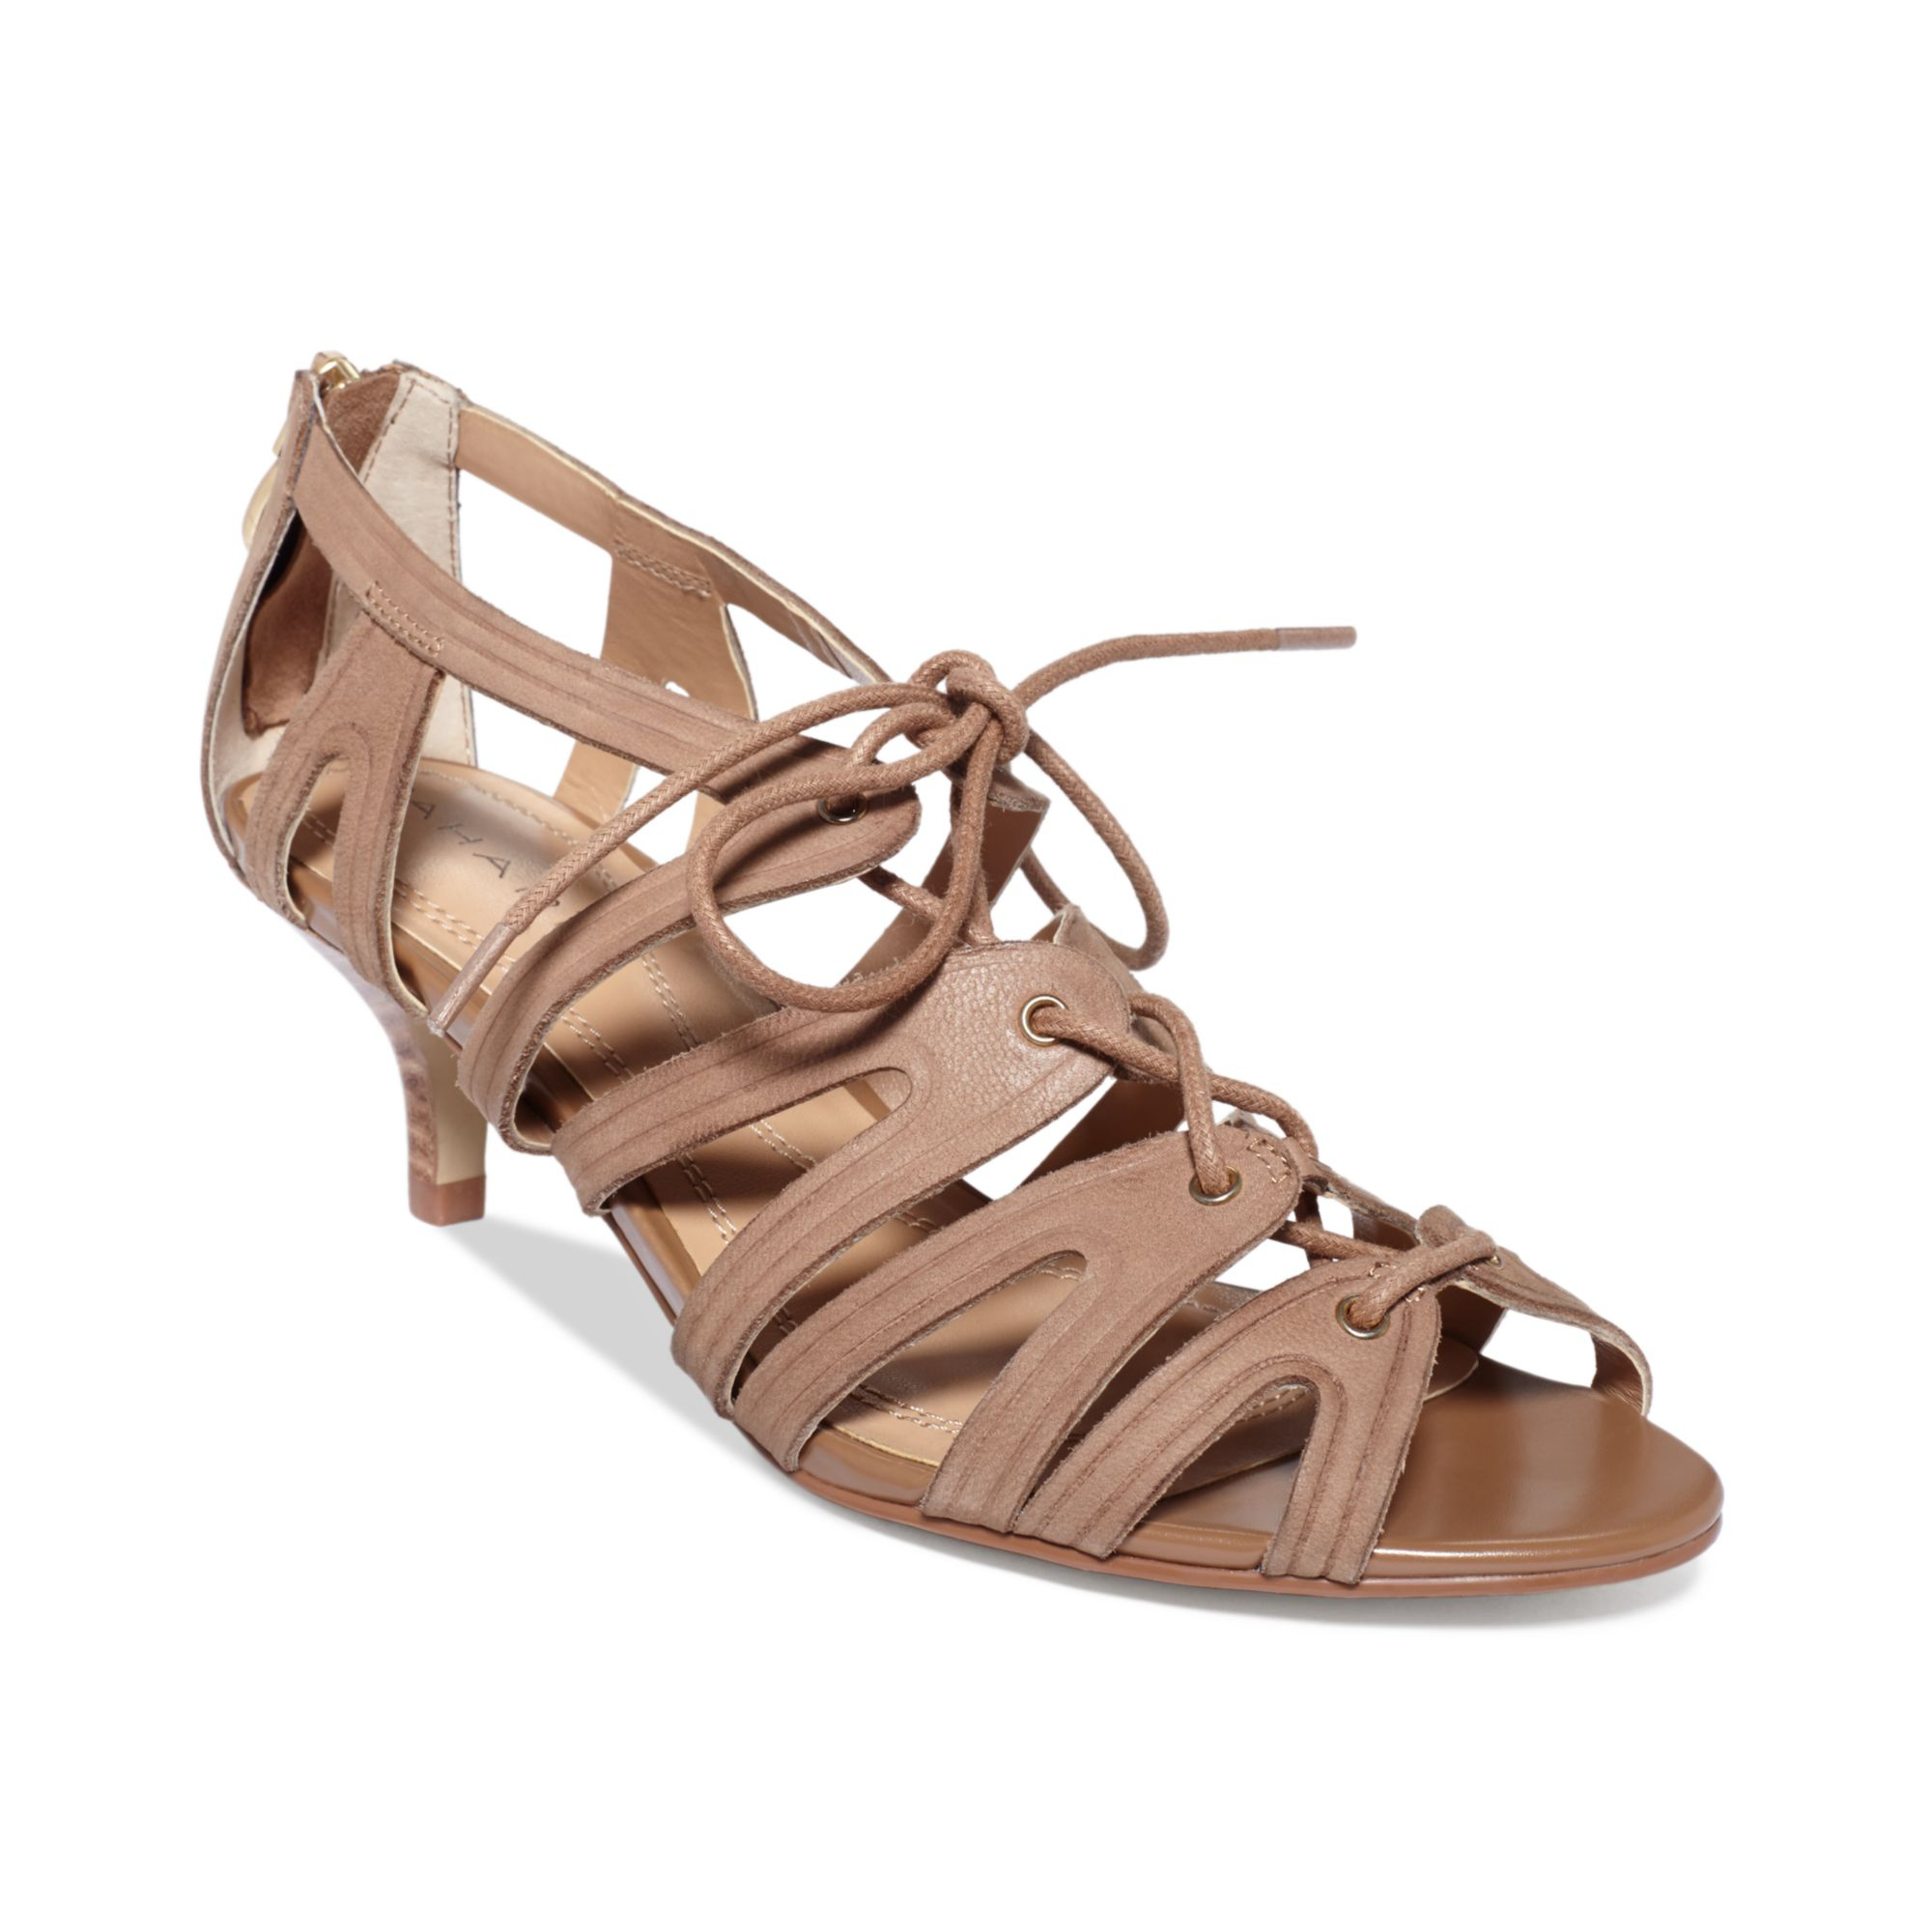 Tahari Womens Darra Kitten Heel Sandals in Natural | Lyst